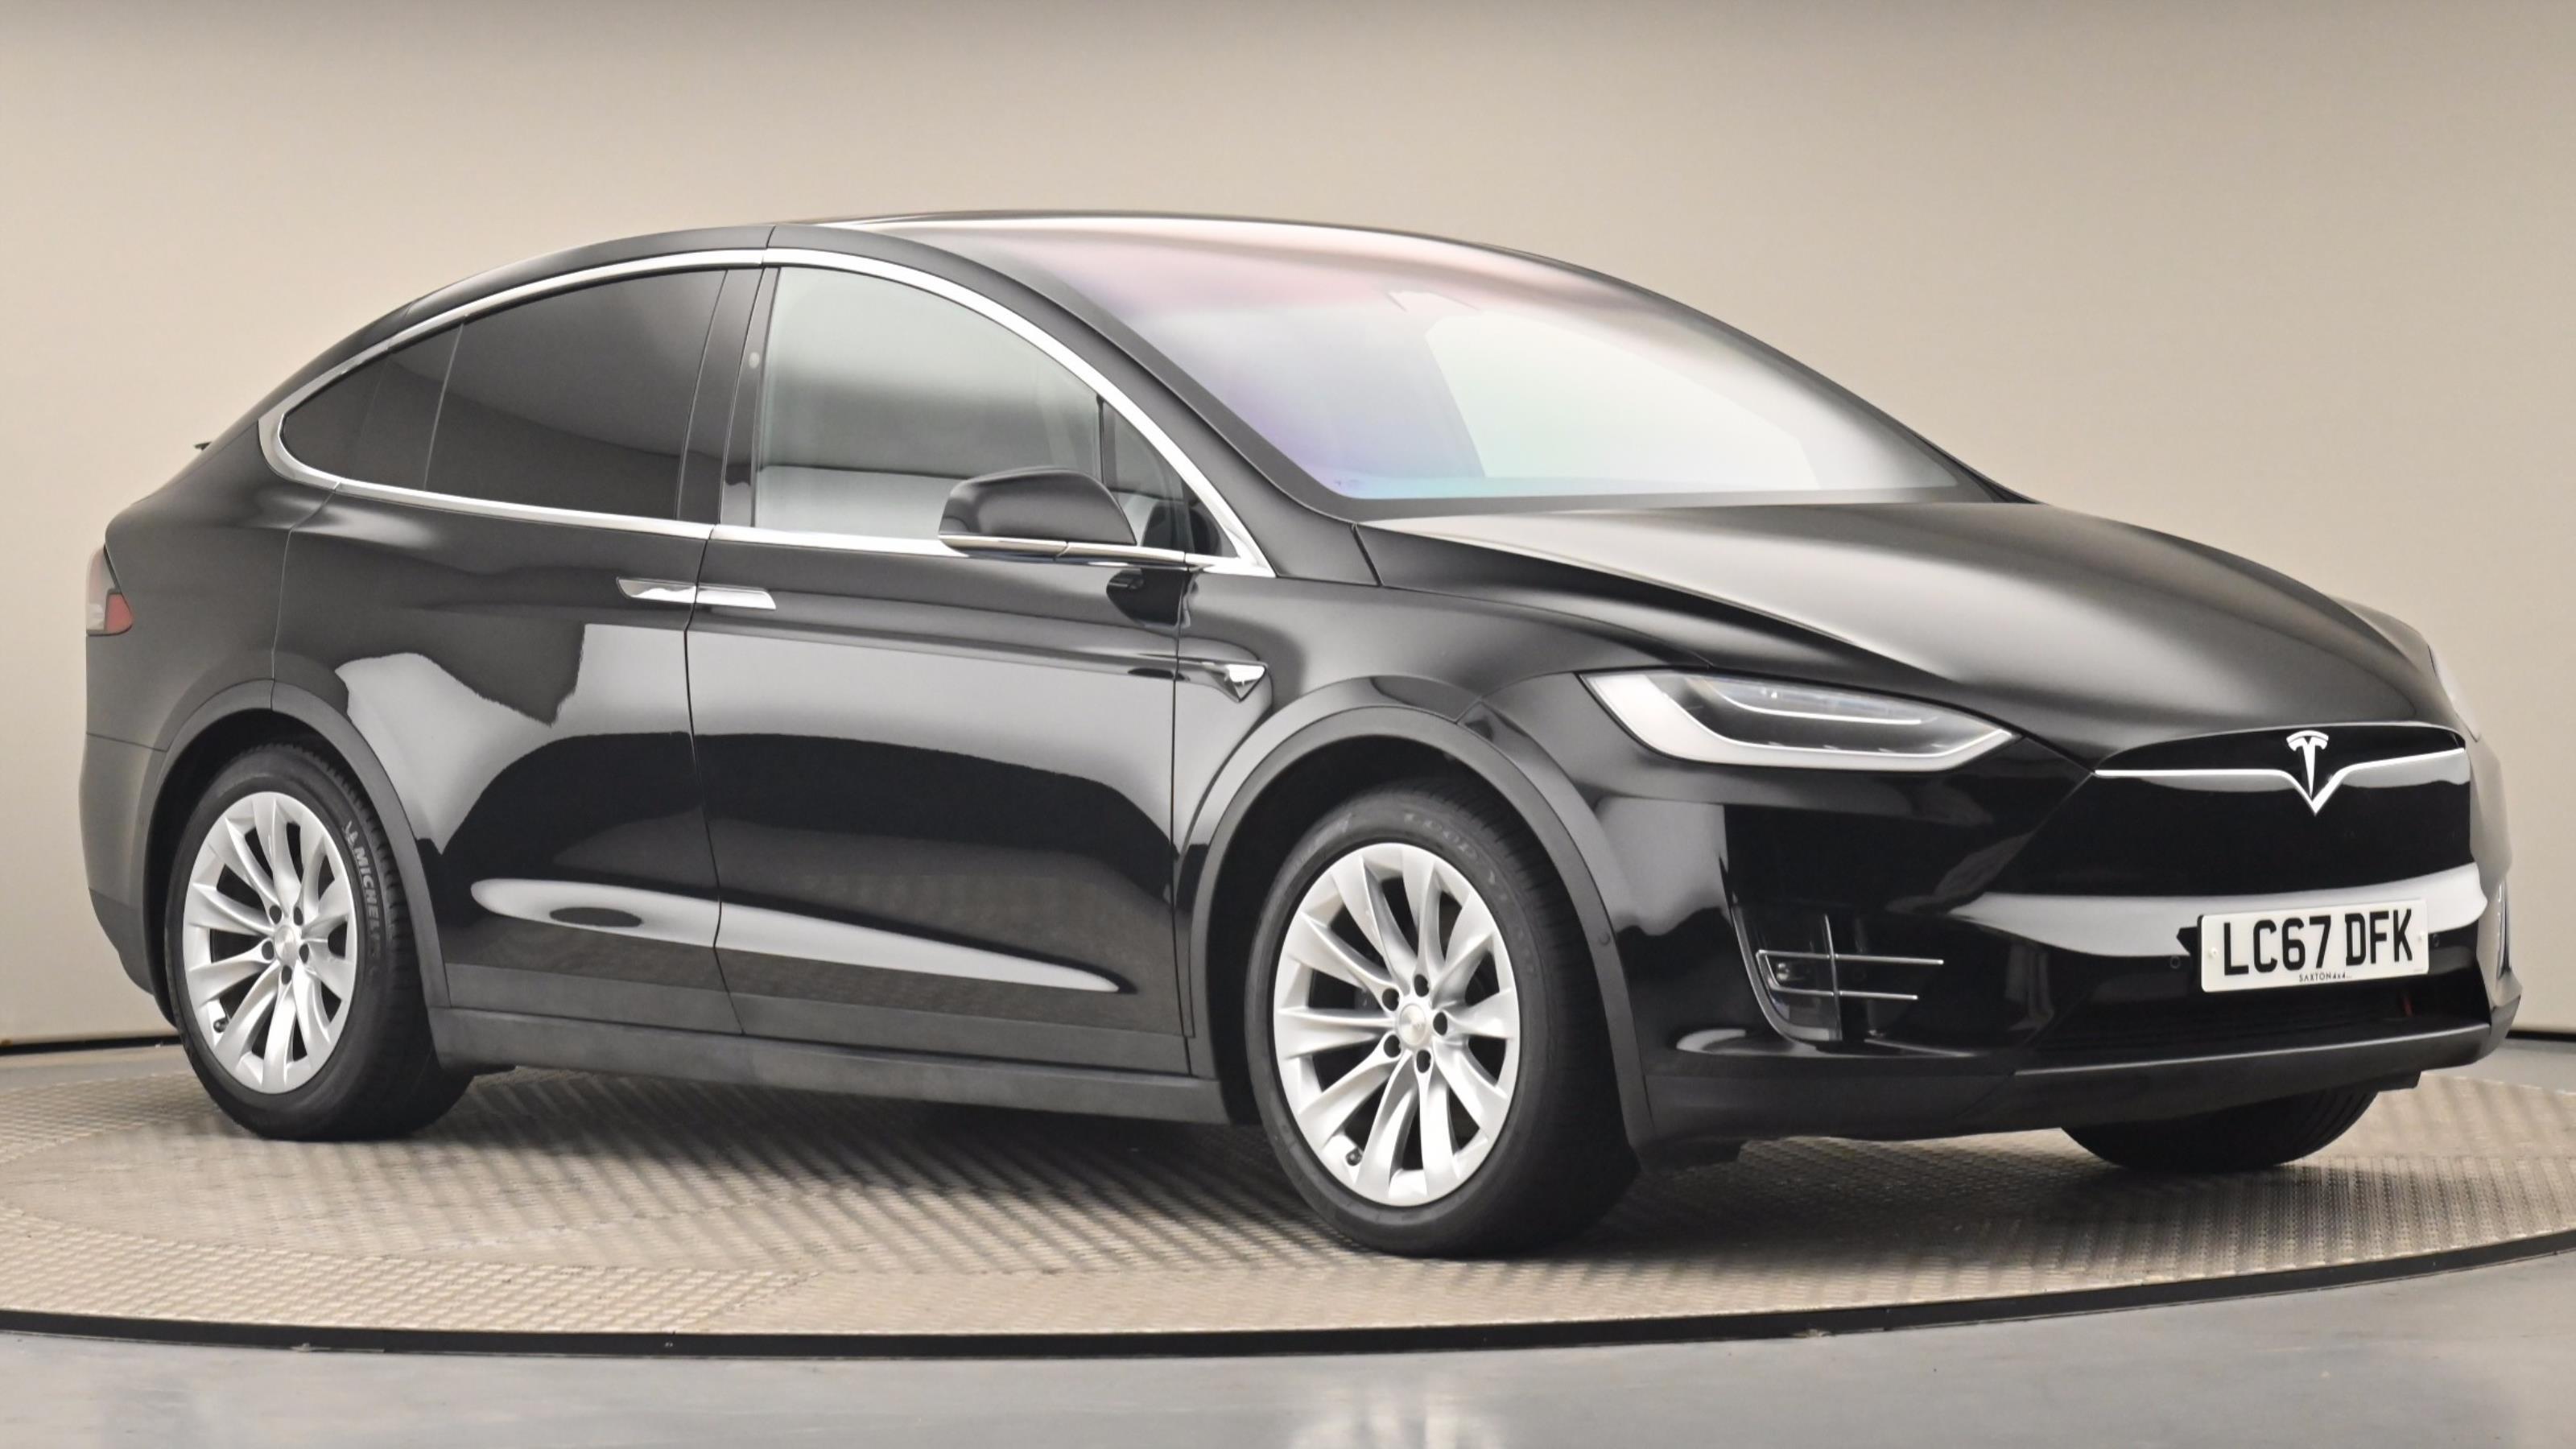 Used 2017 Tesla MODEL X 449kW 100kWh Dual Motor 5dr Auto BLACK at Saxton4x4